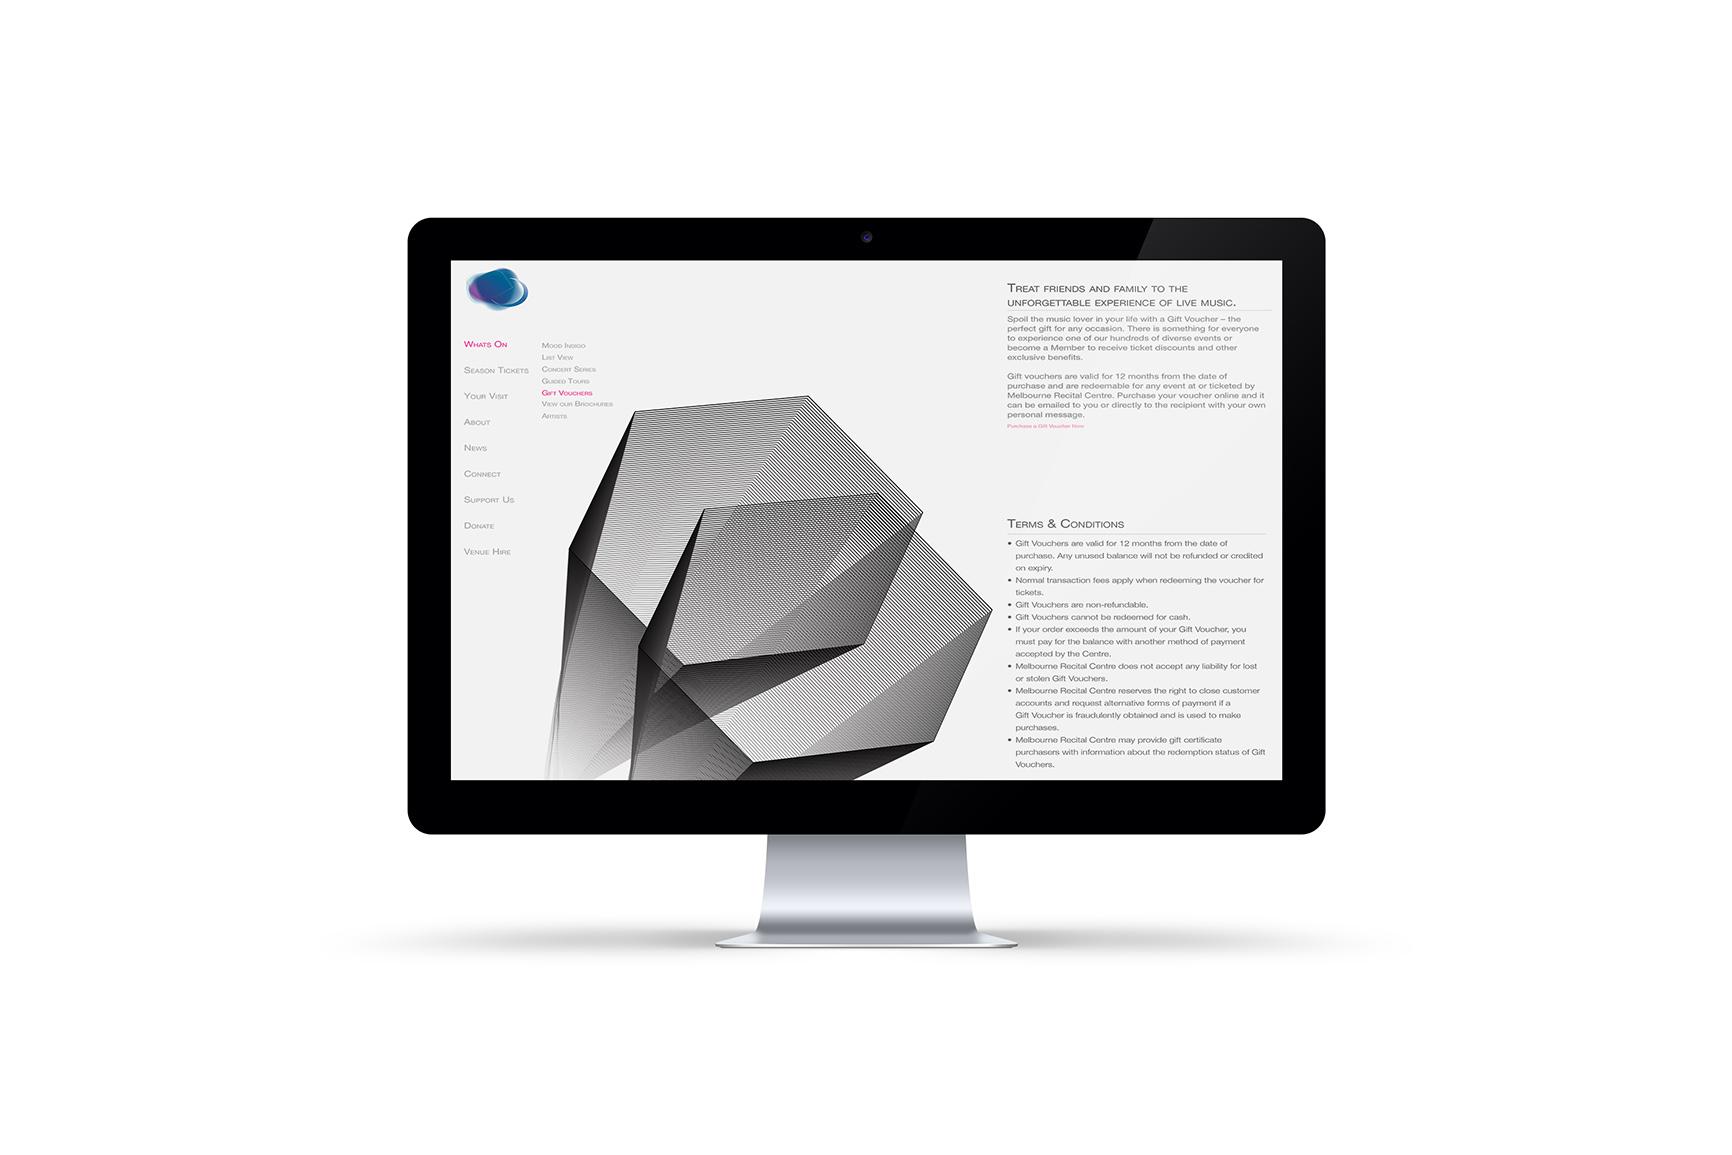 website8.jpg